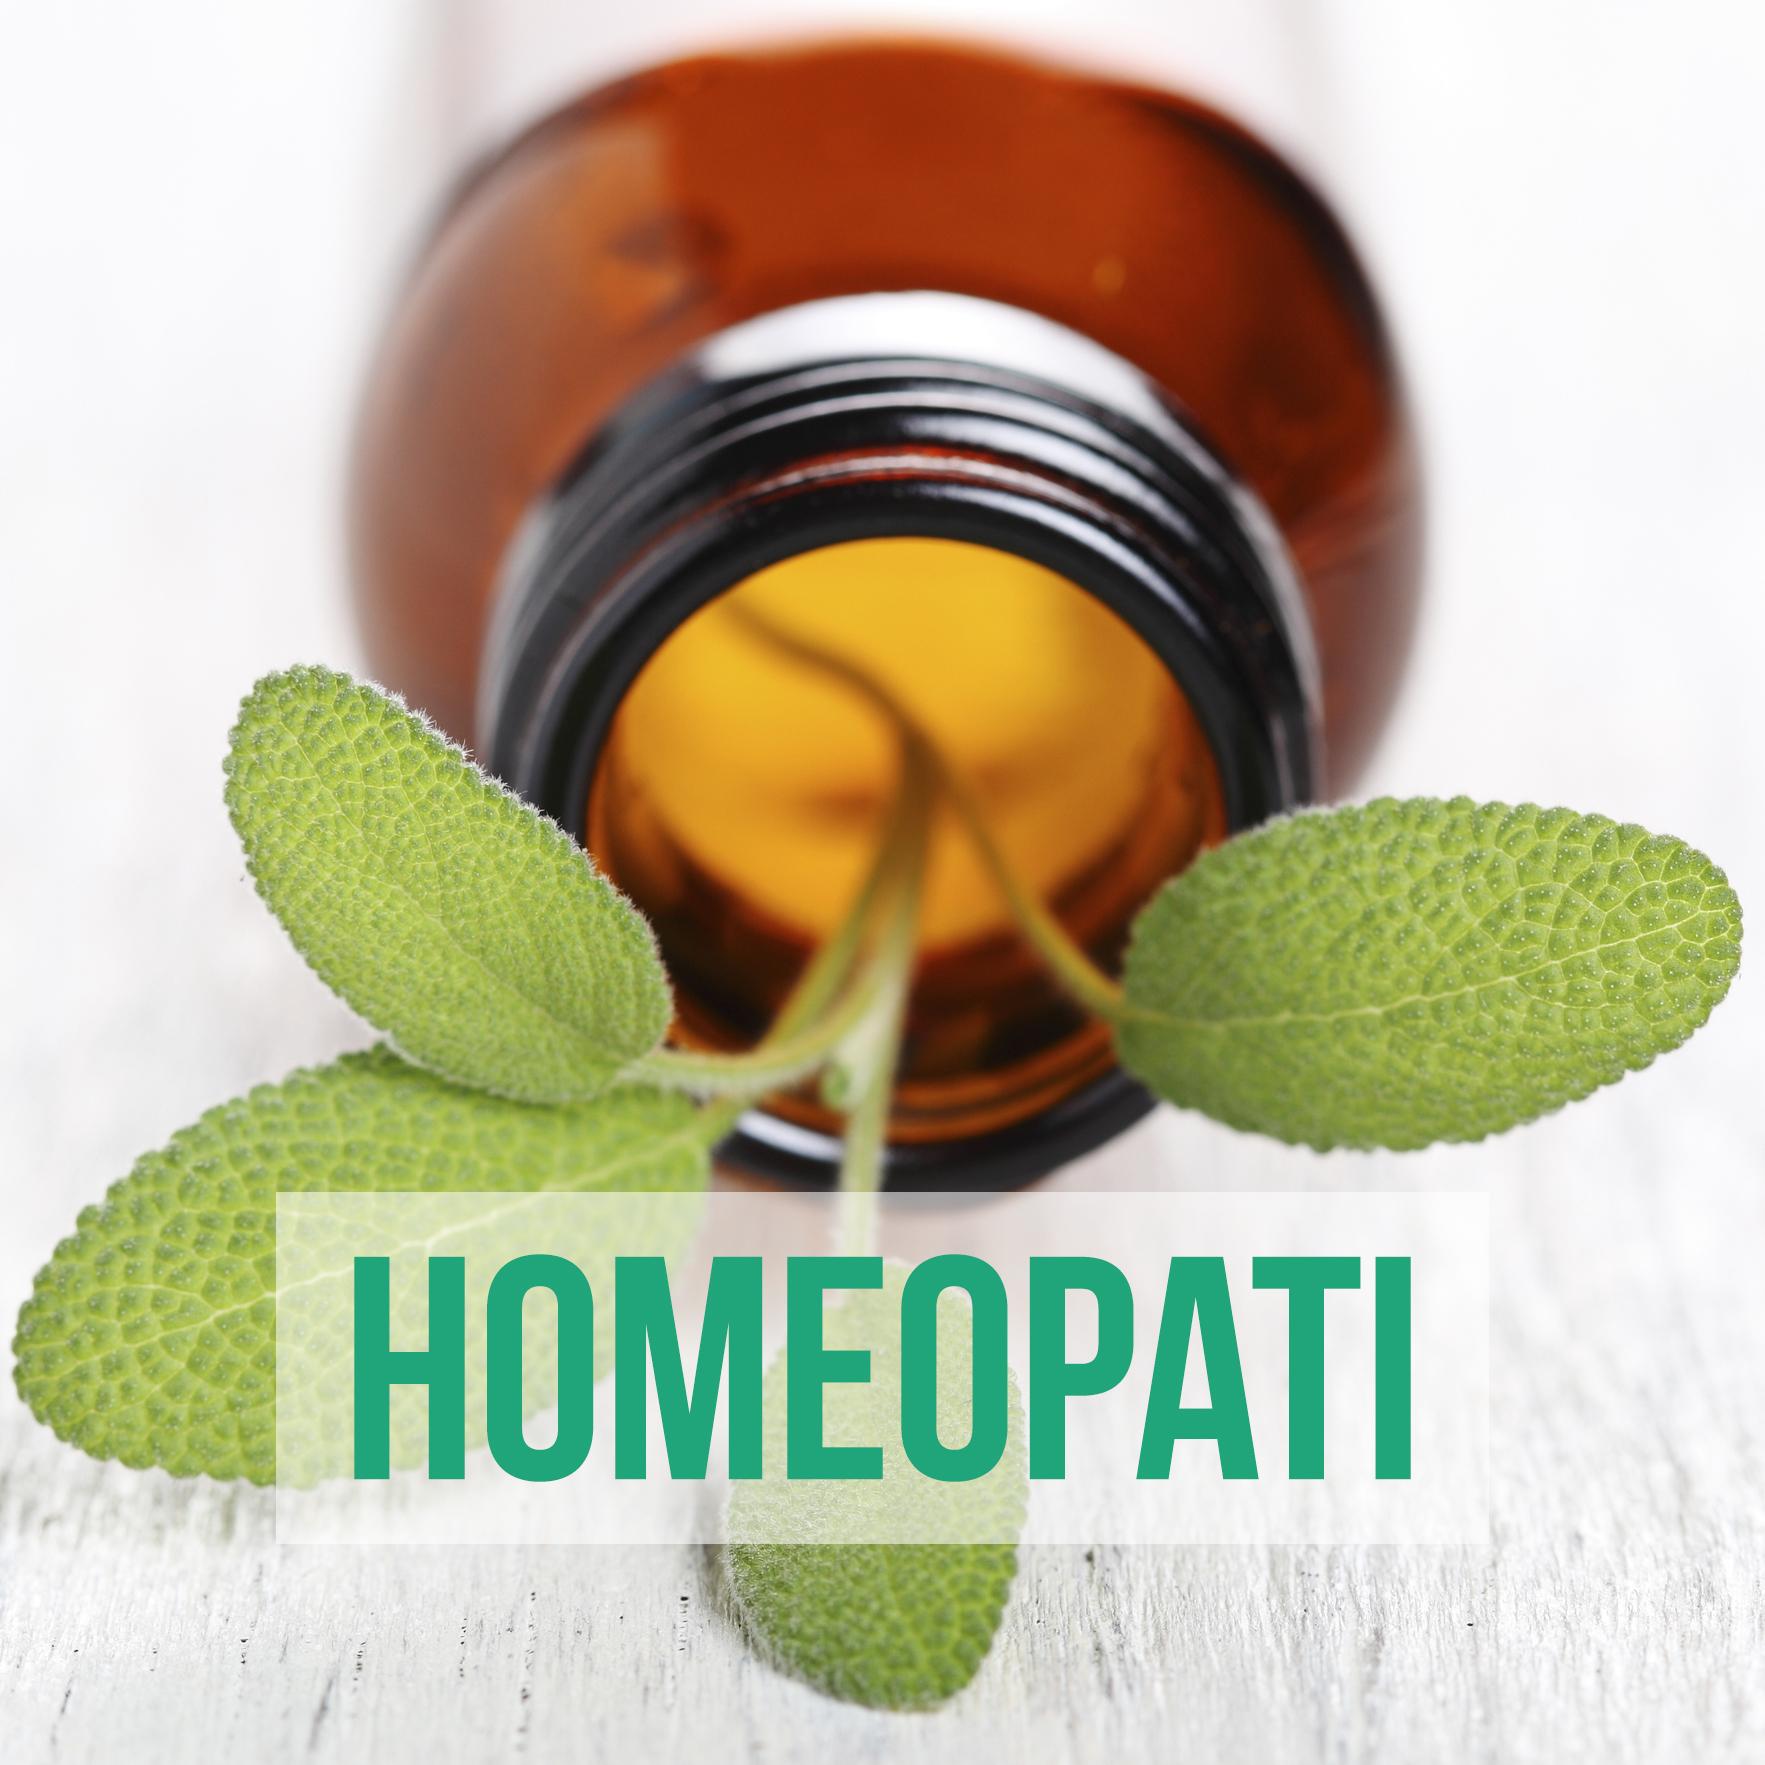 Homeopati - burk med gröna blad